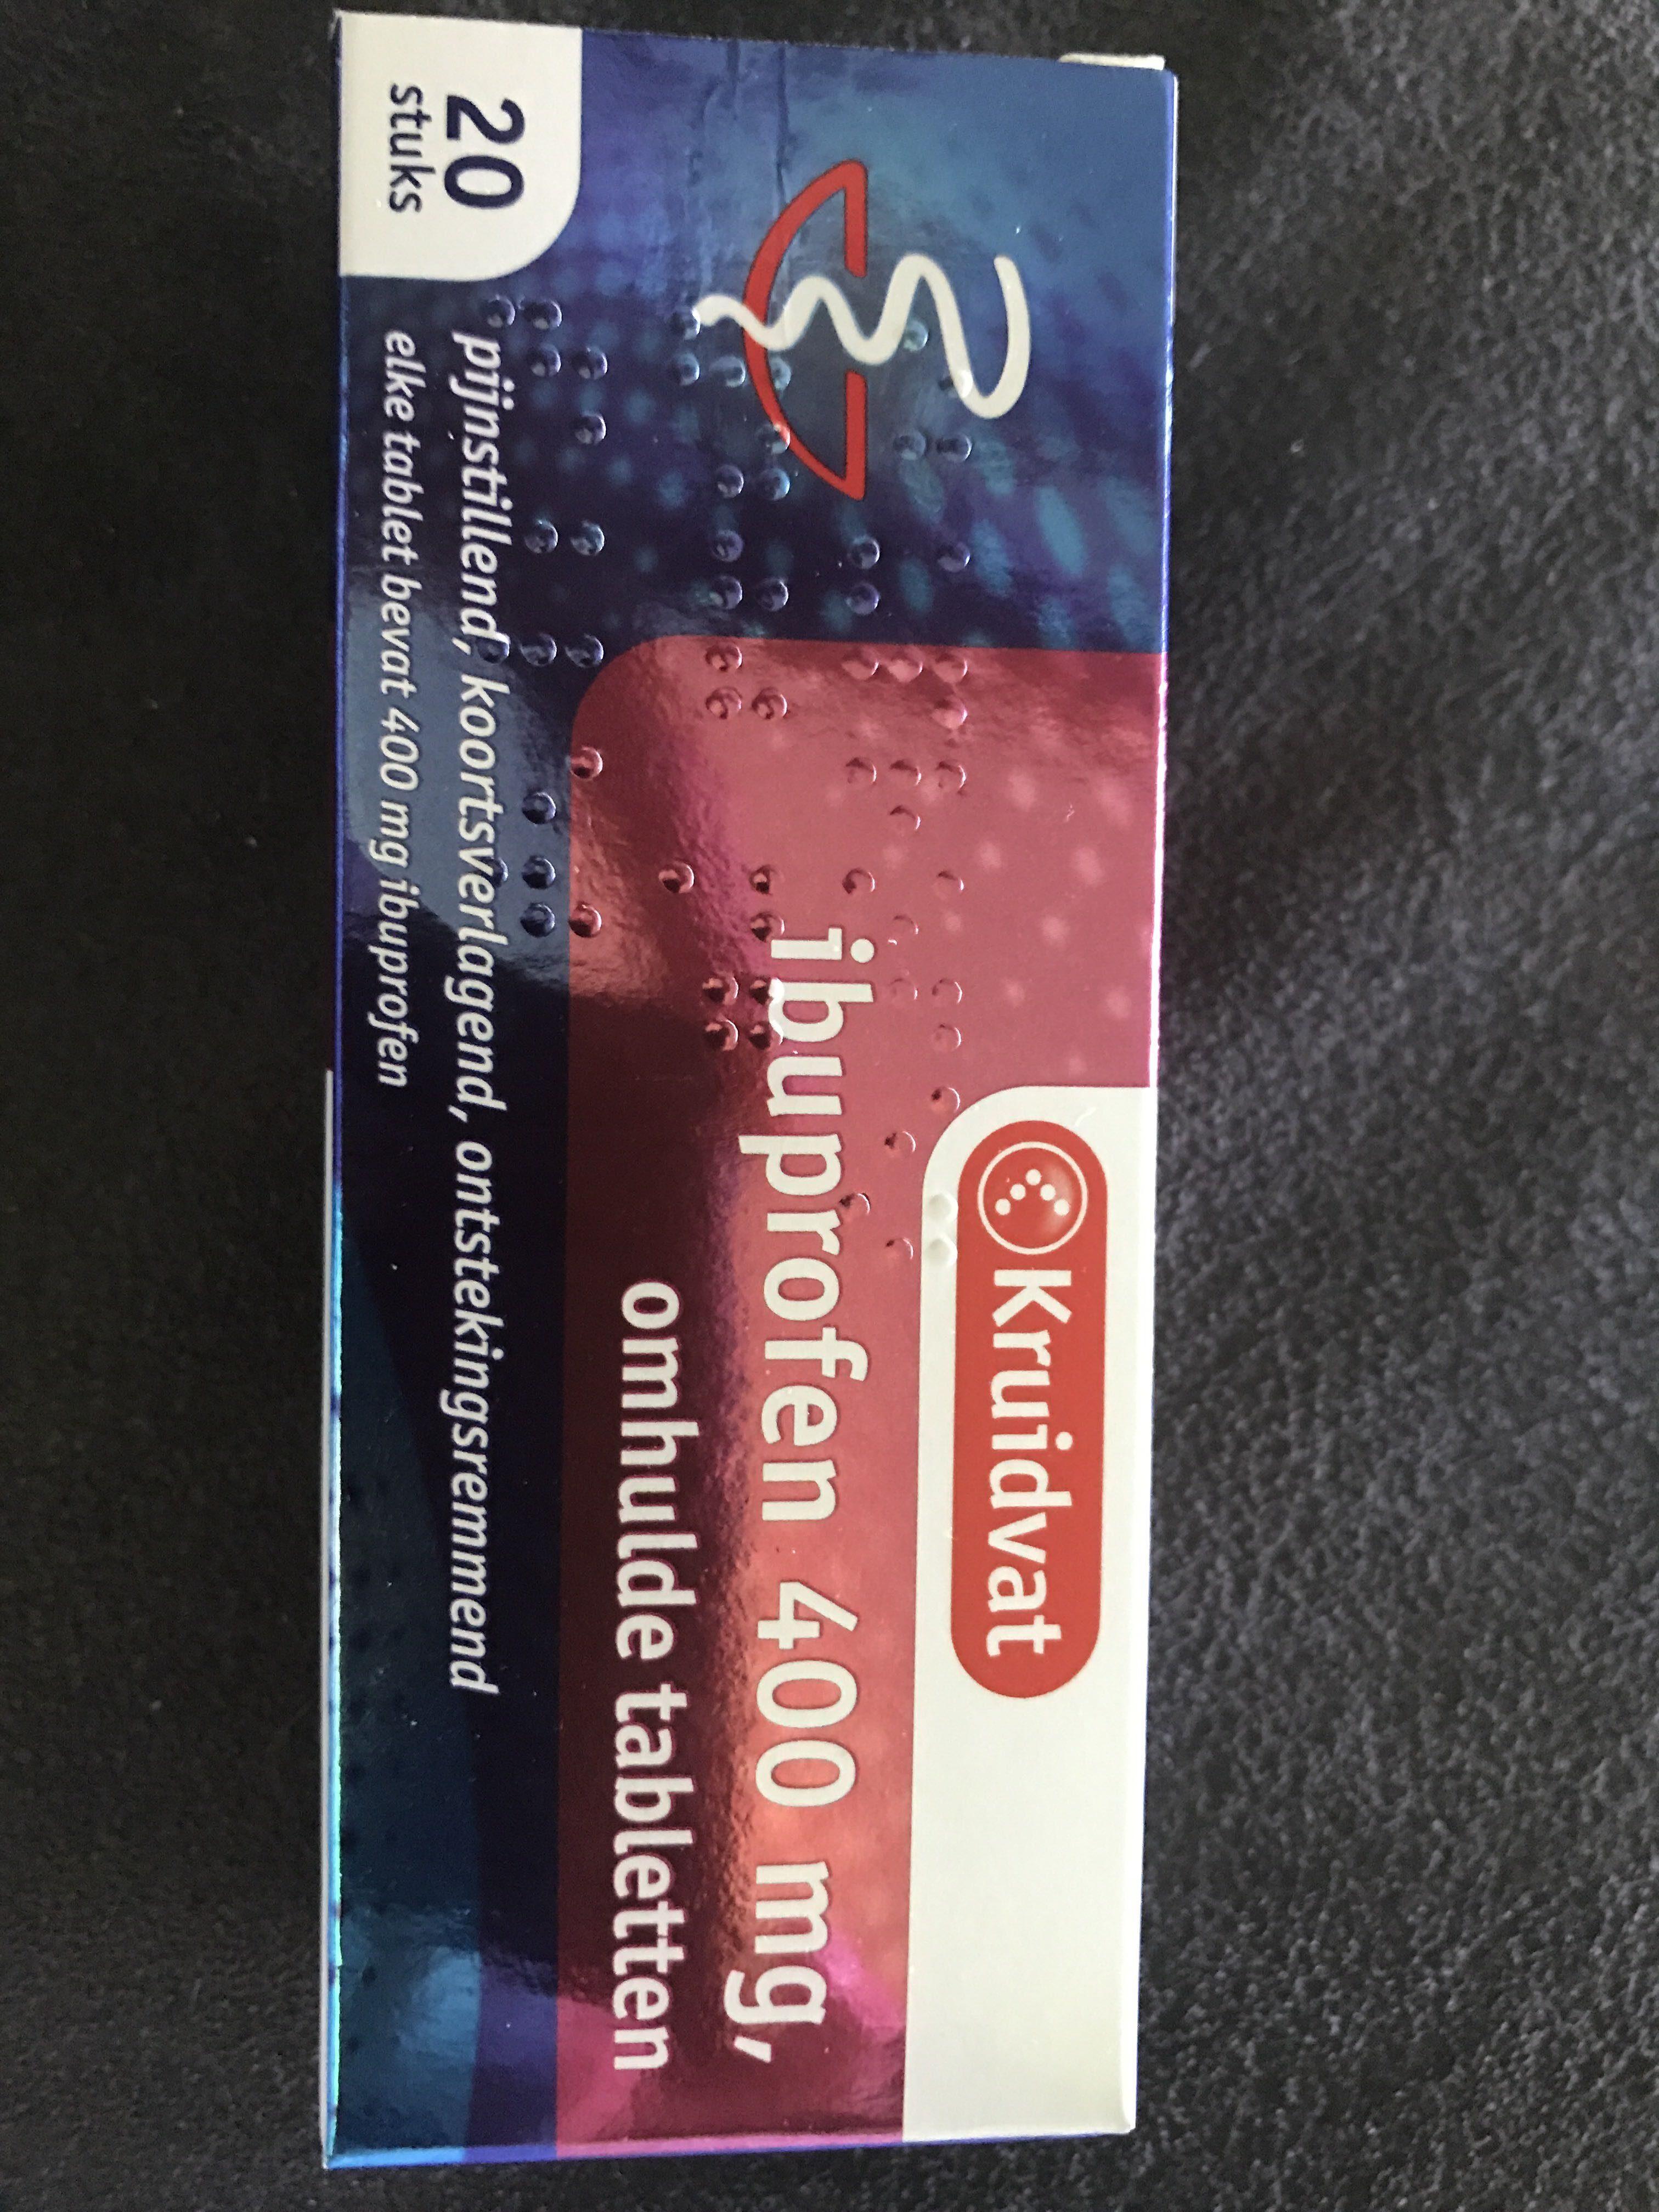 Ibuprofen 400mg - Product